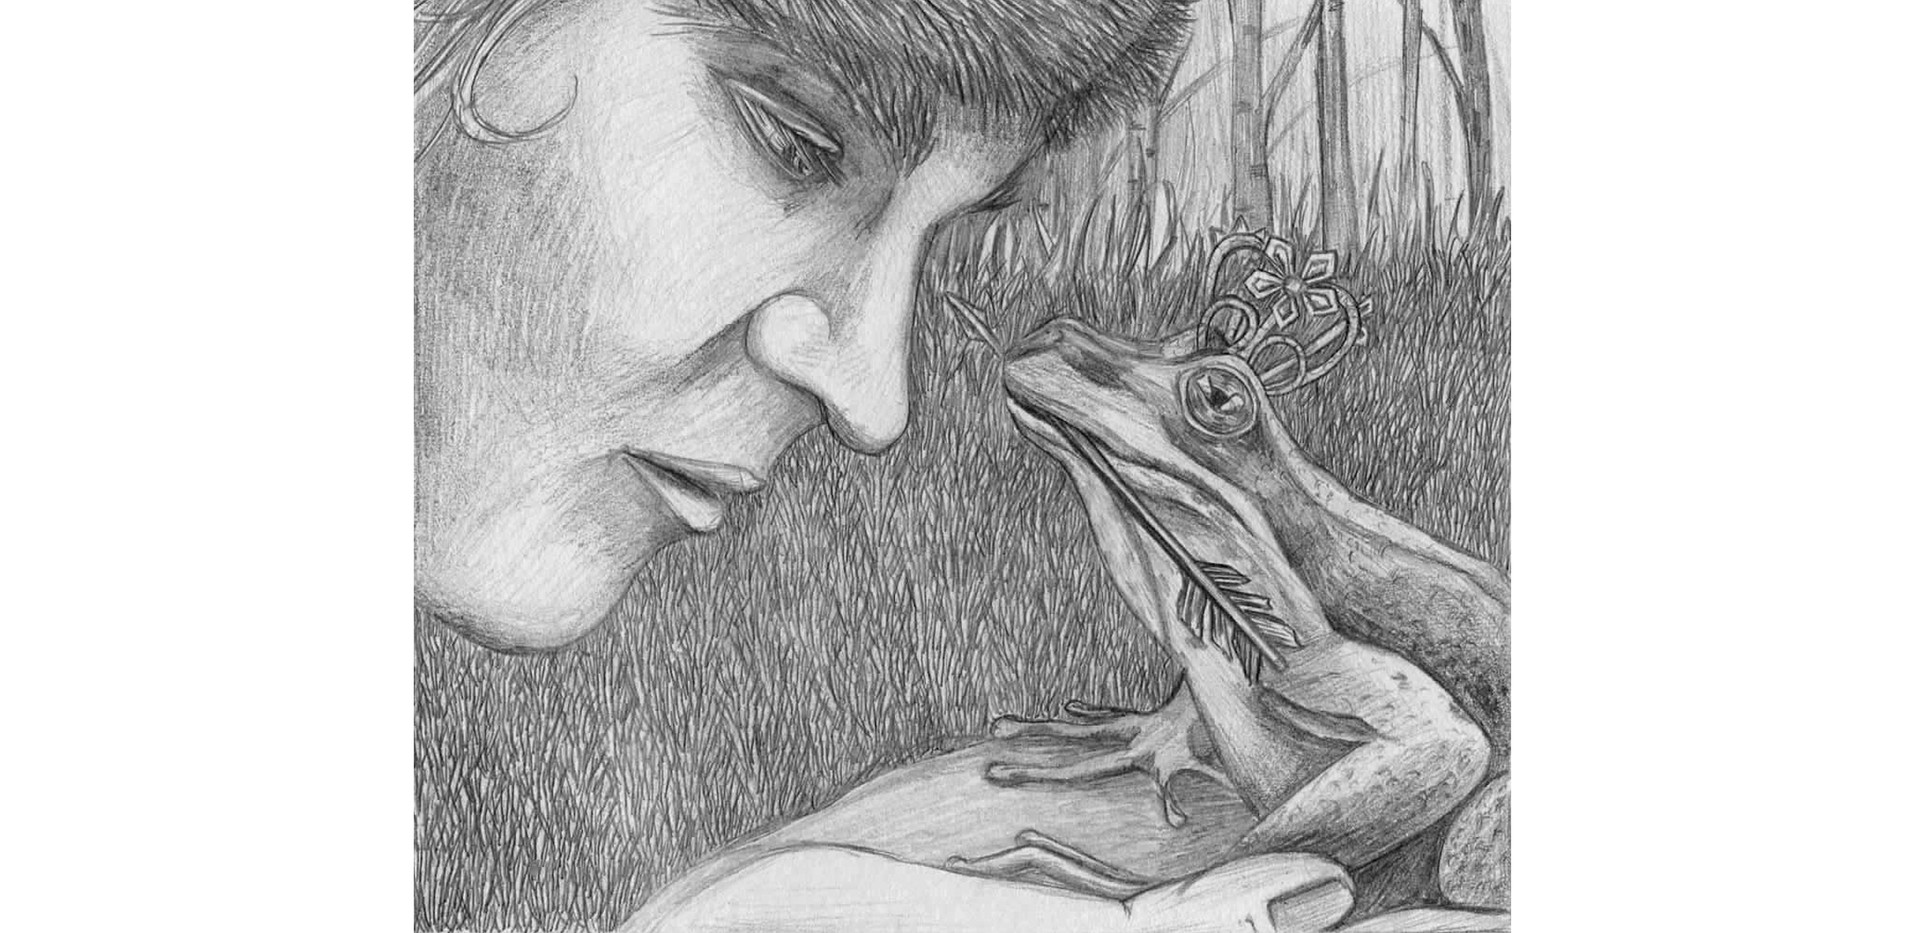 Folklore character- Tsarevna Frog